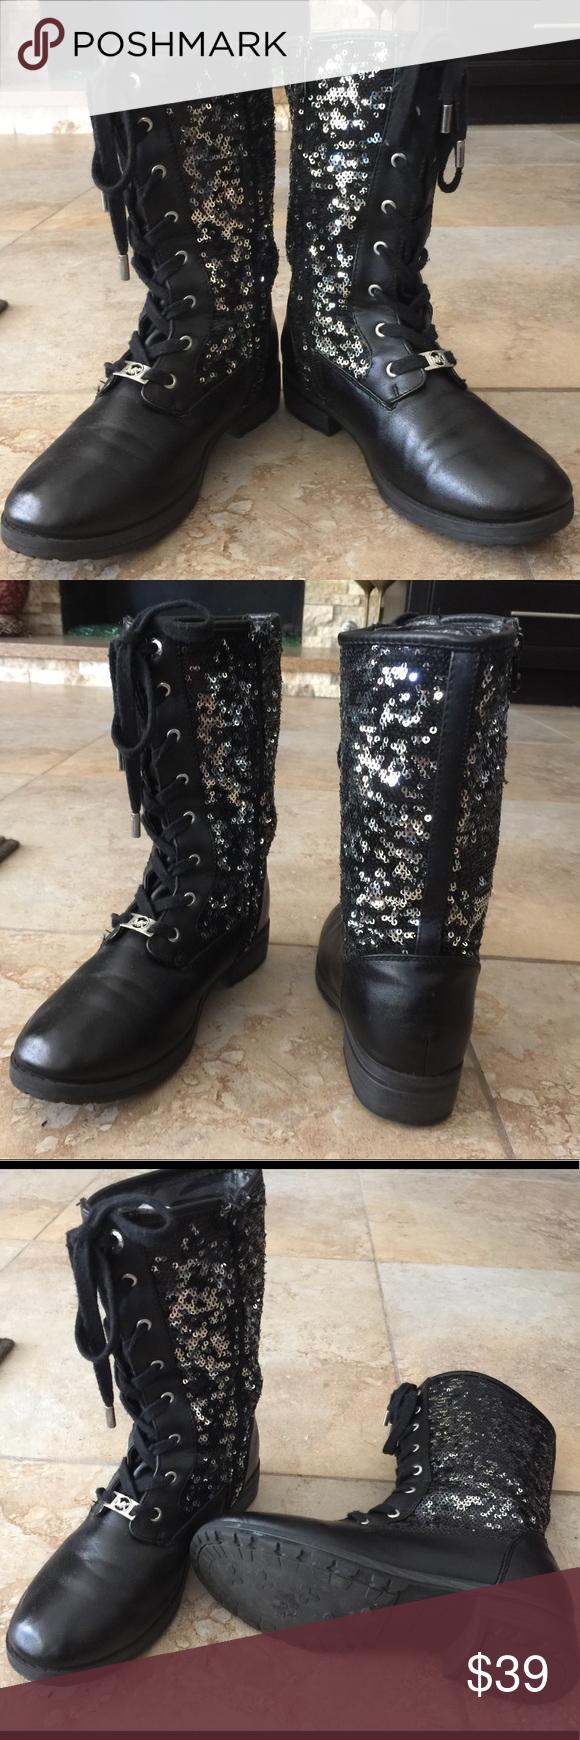 Michael Kors Glitter Girl's boots size